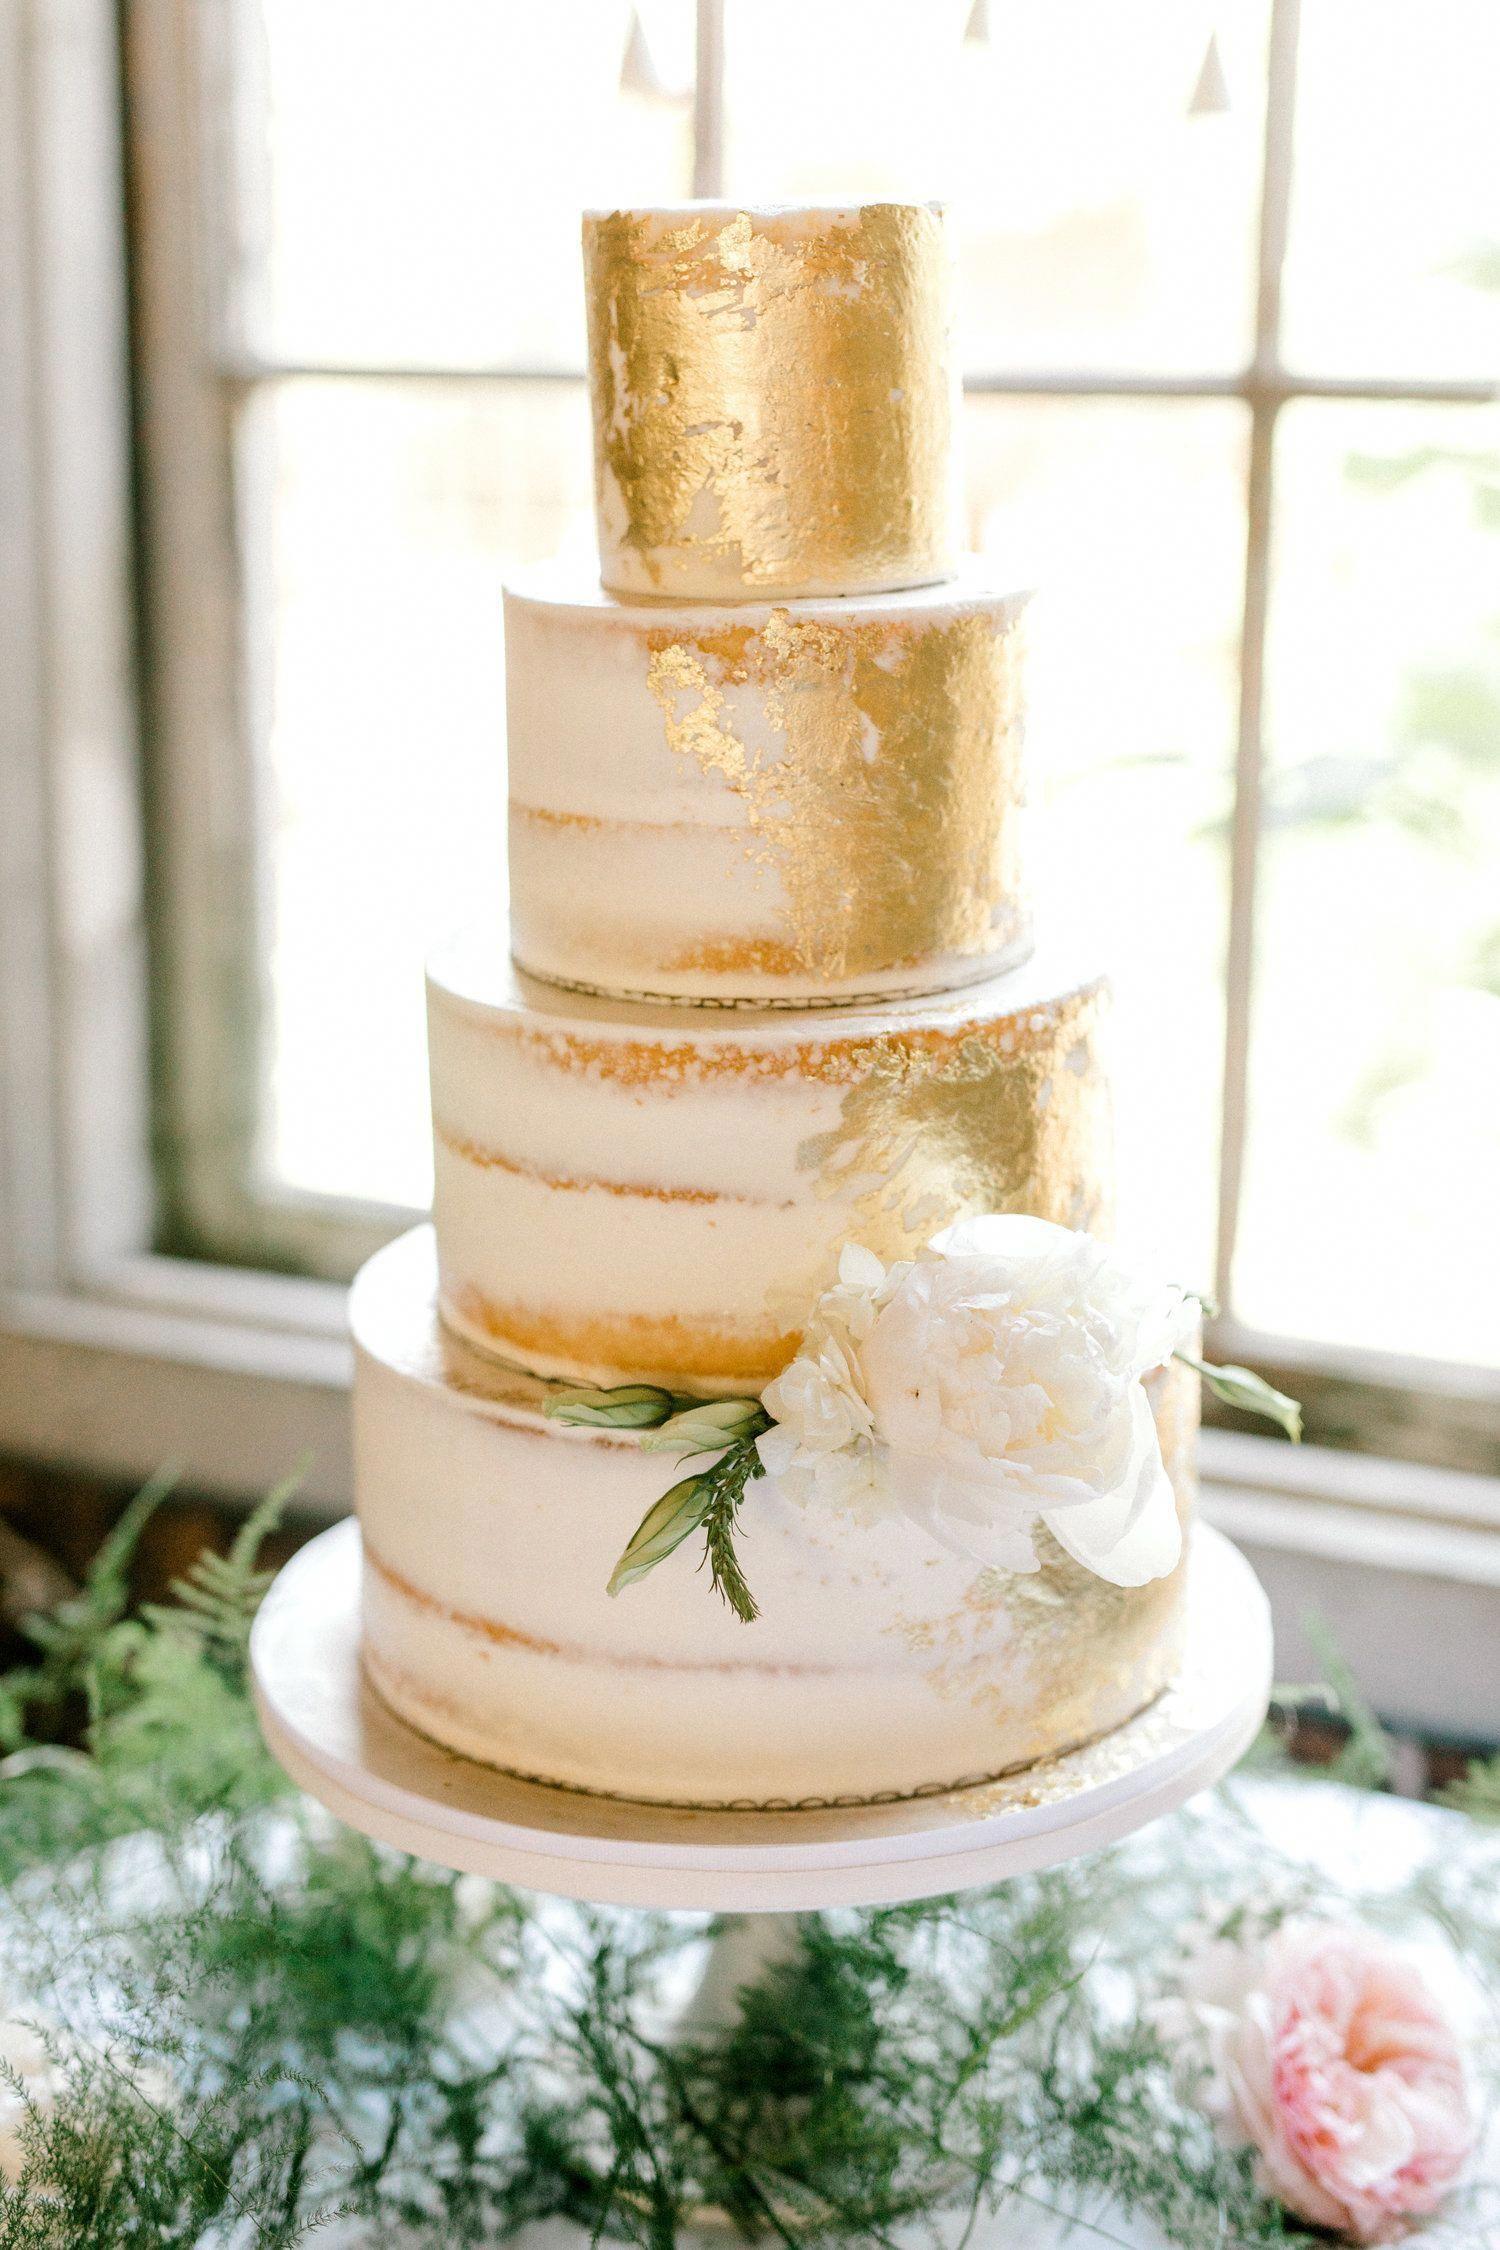 Pin on Wedding Cake A&F